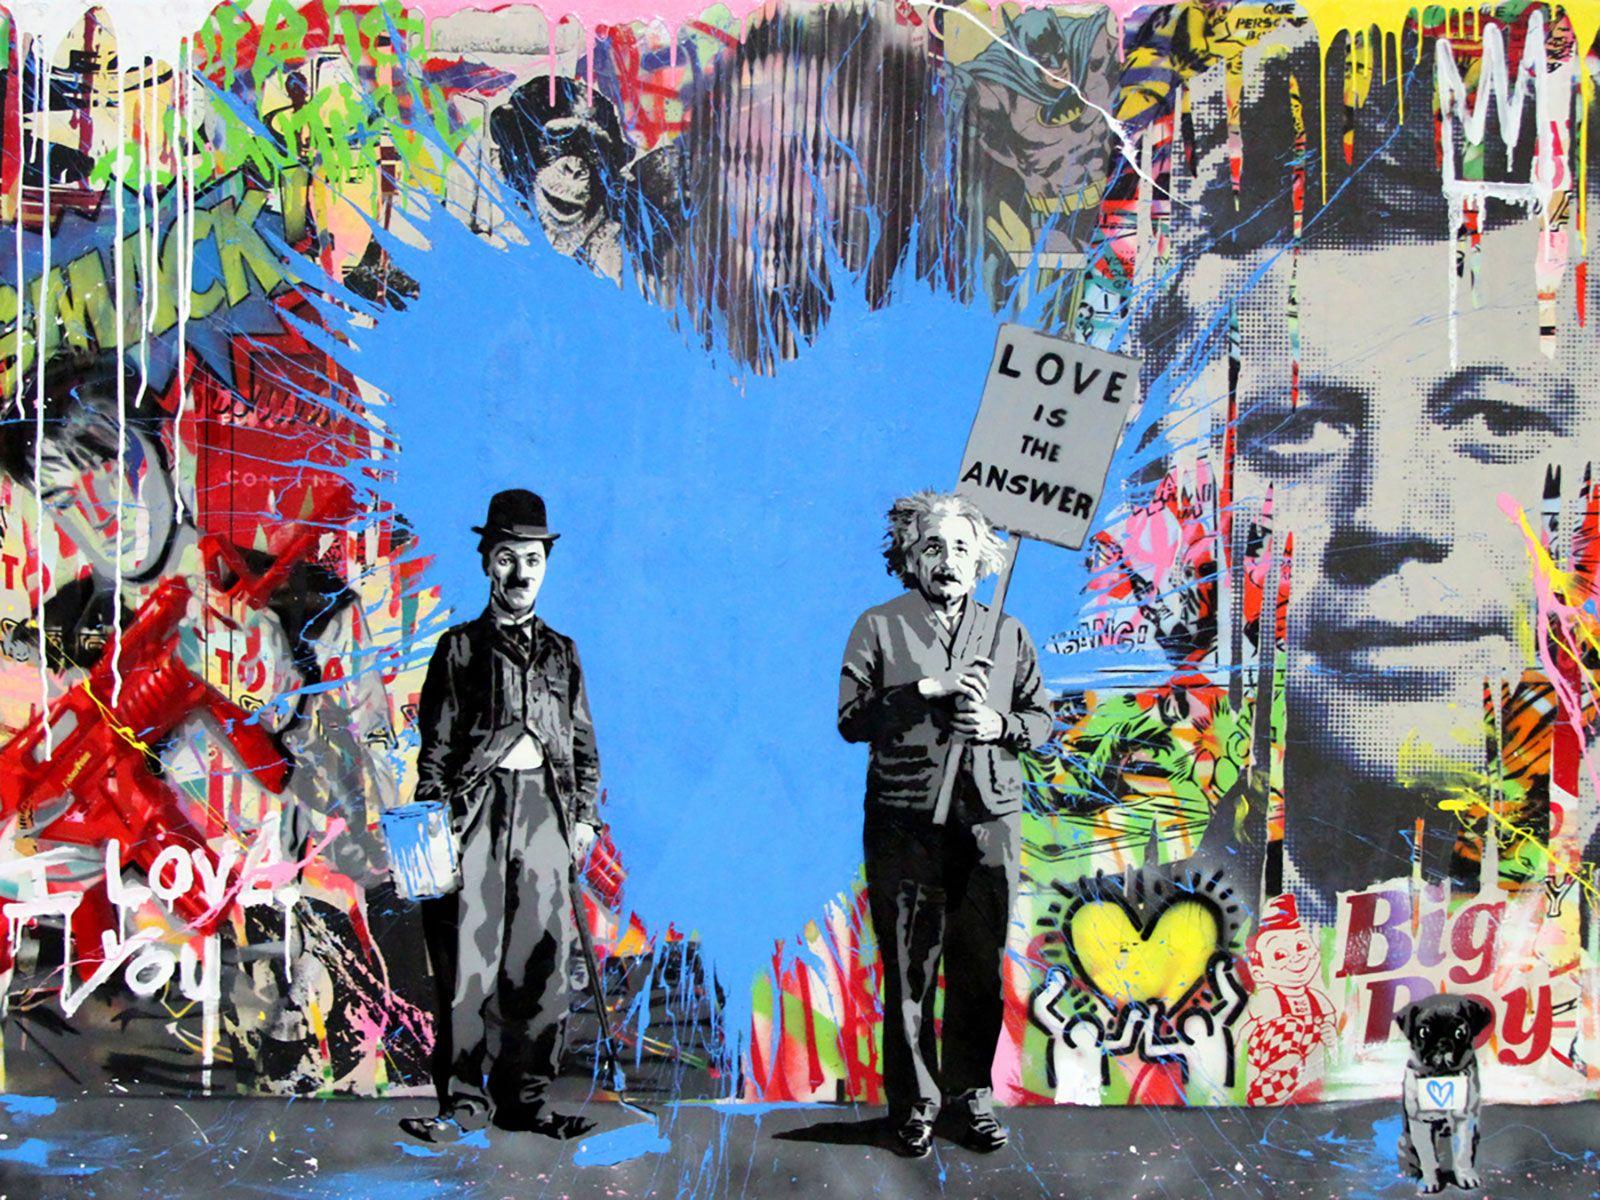 Brainwash-Juxtapose-mixed-media-on-canvas